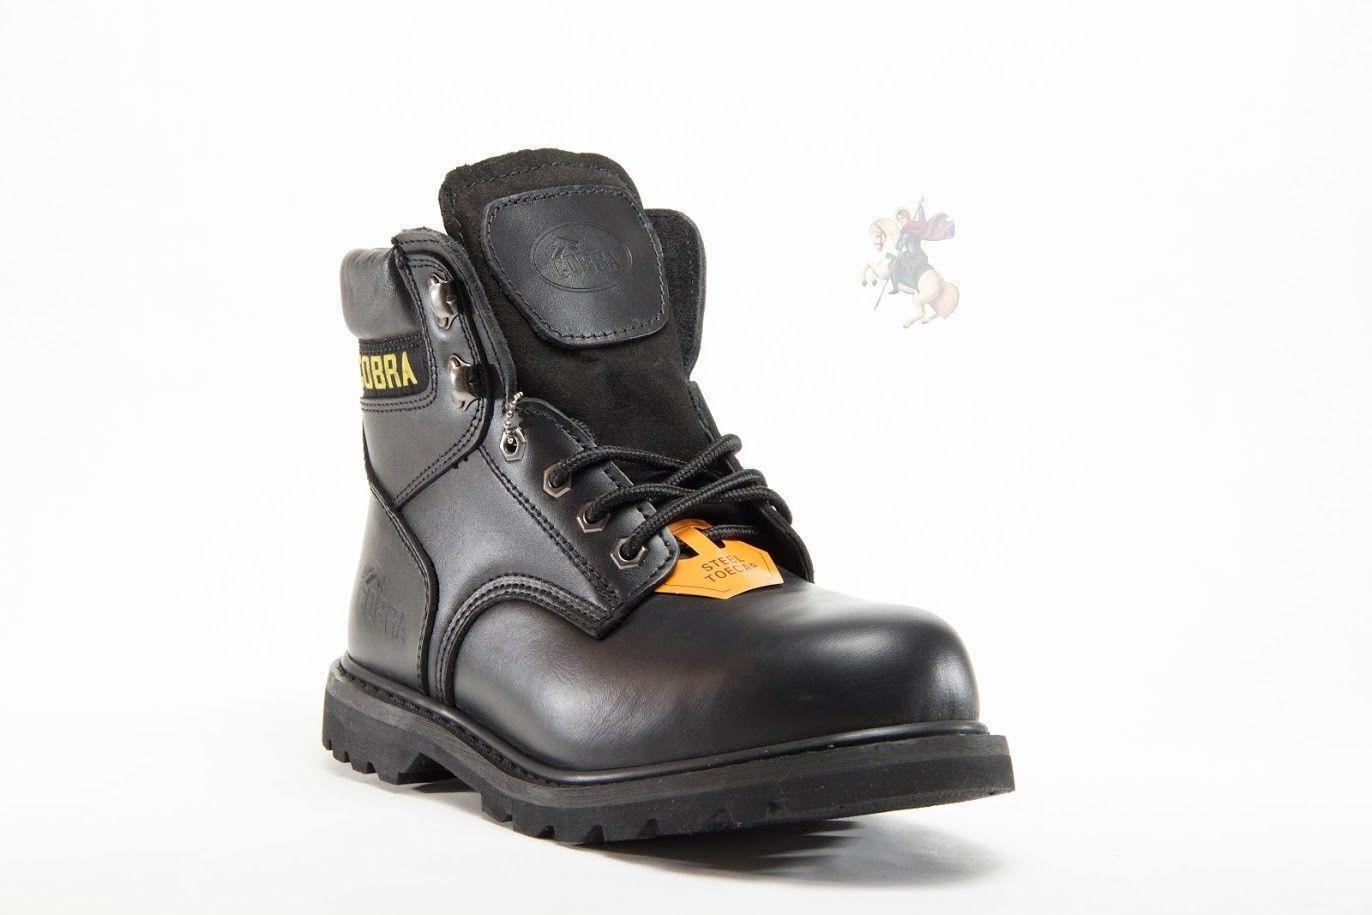 Men Work Boot Cobra C826S Steel Toe Black Leather Goodyear Welt Construction